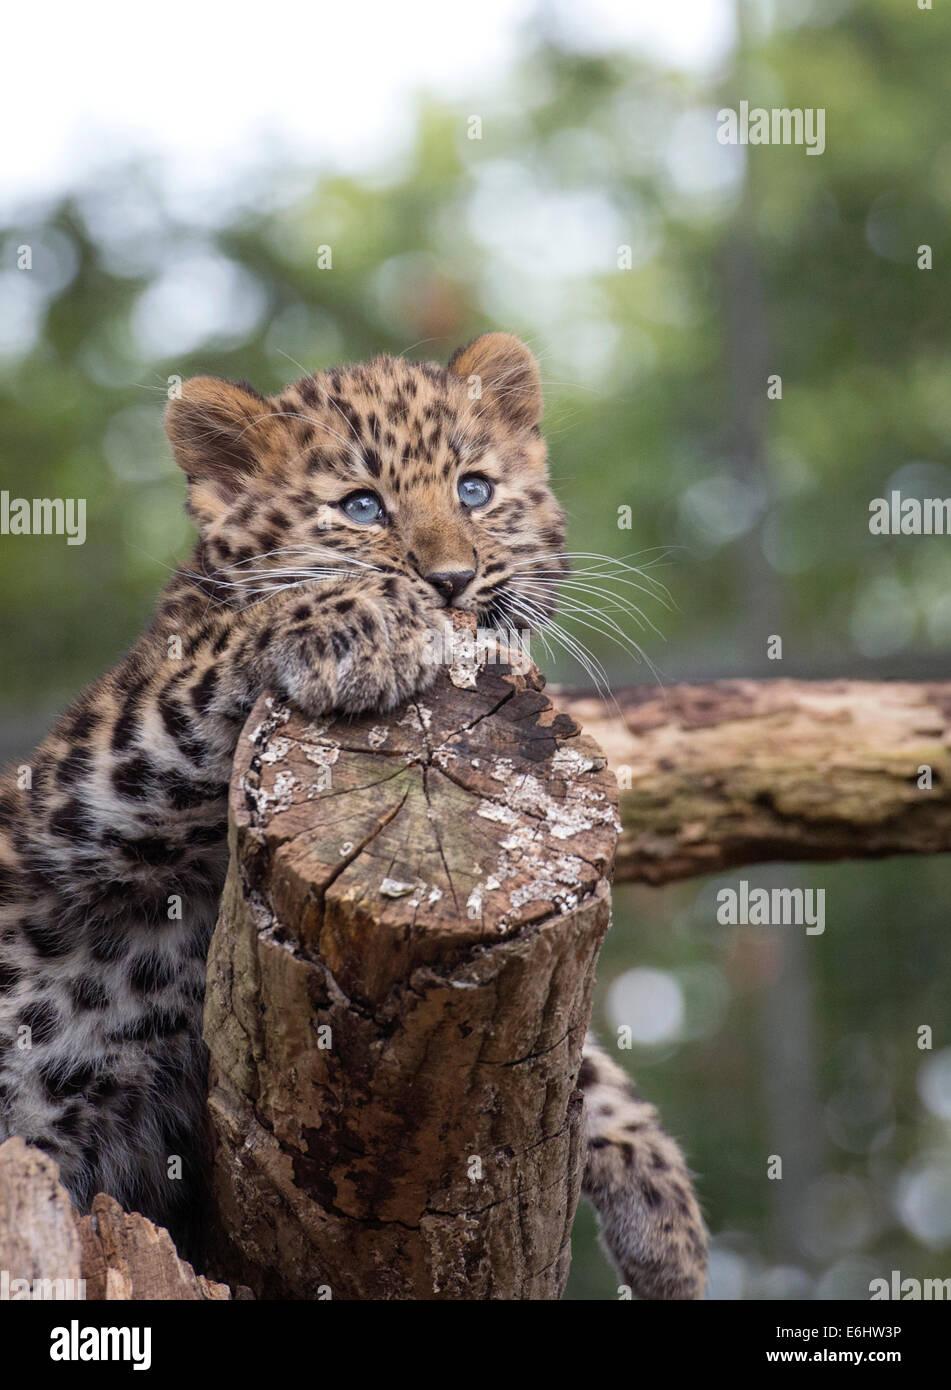 Female Amur leopard cub on tree stump Stock Photo